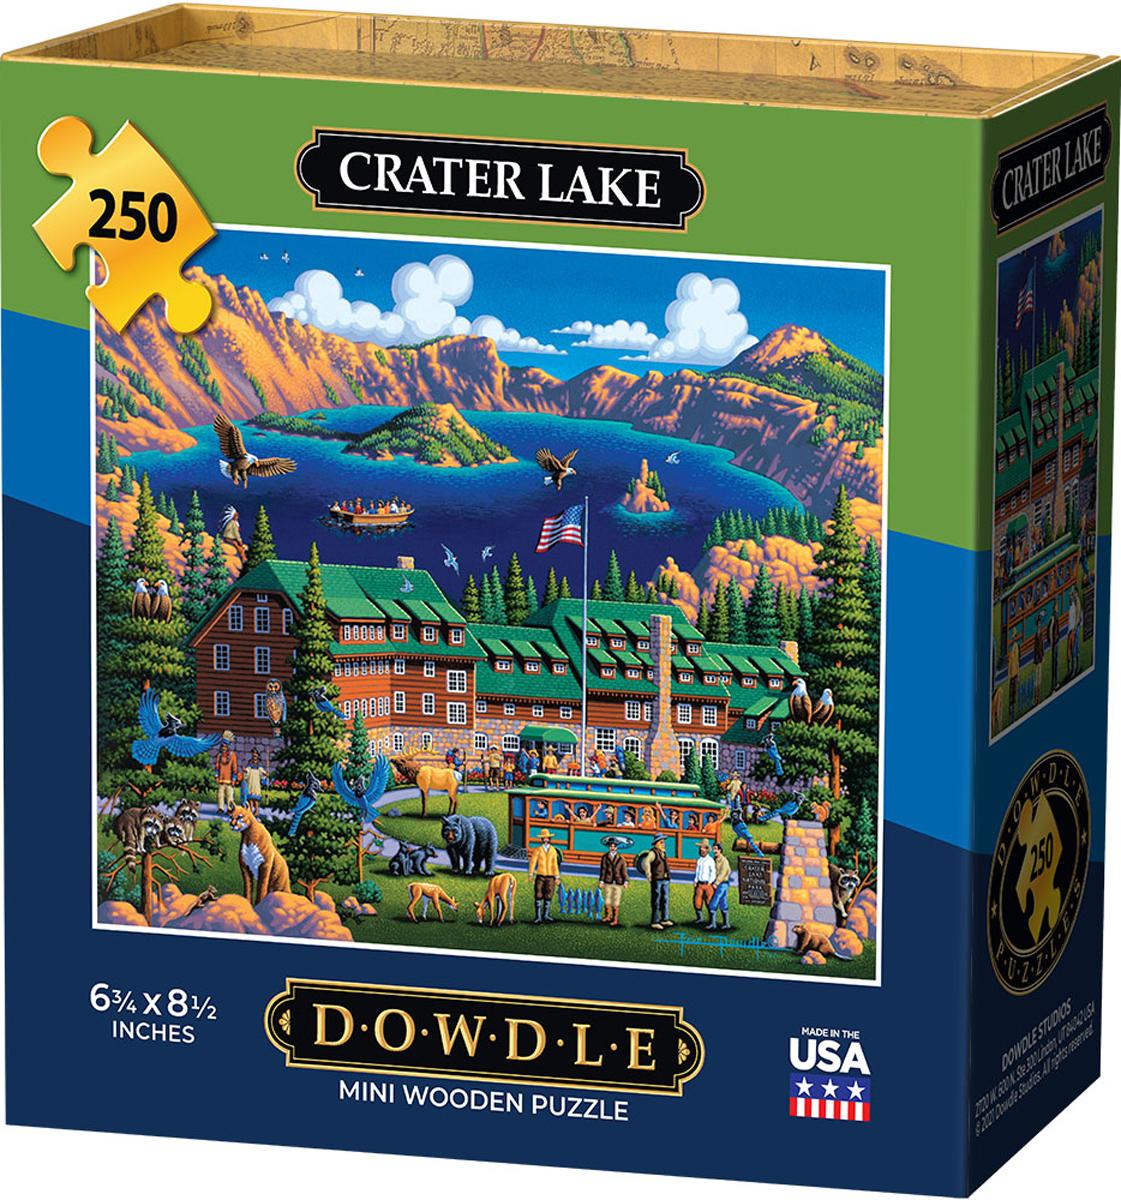 Crater Lake Lakes / Rivers / Streams Jigsaw Puzzle